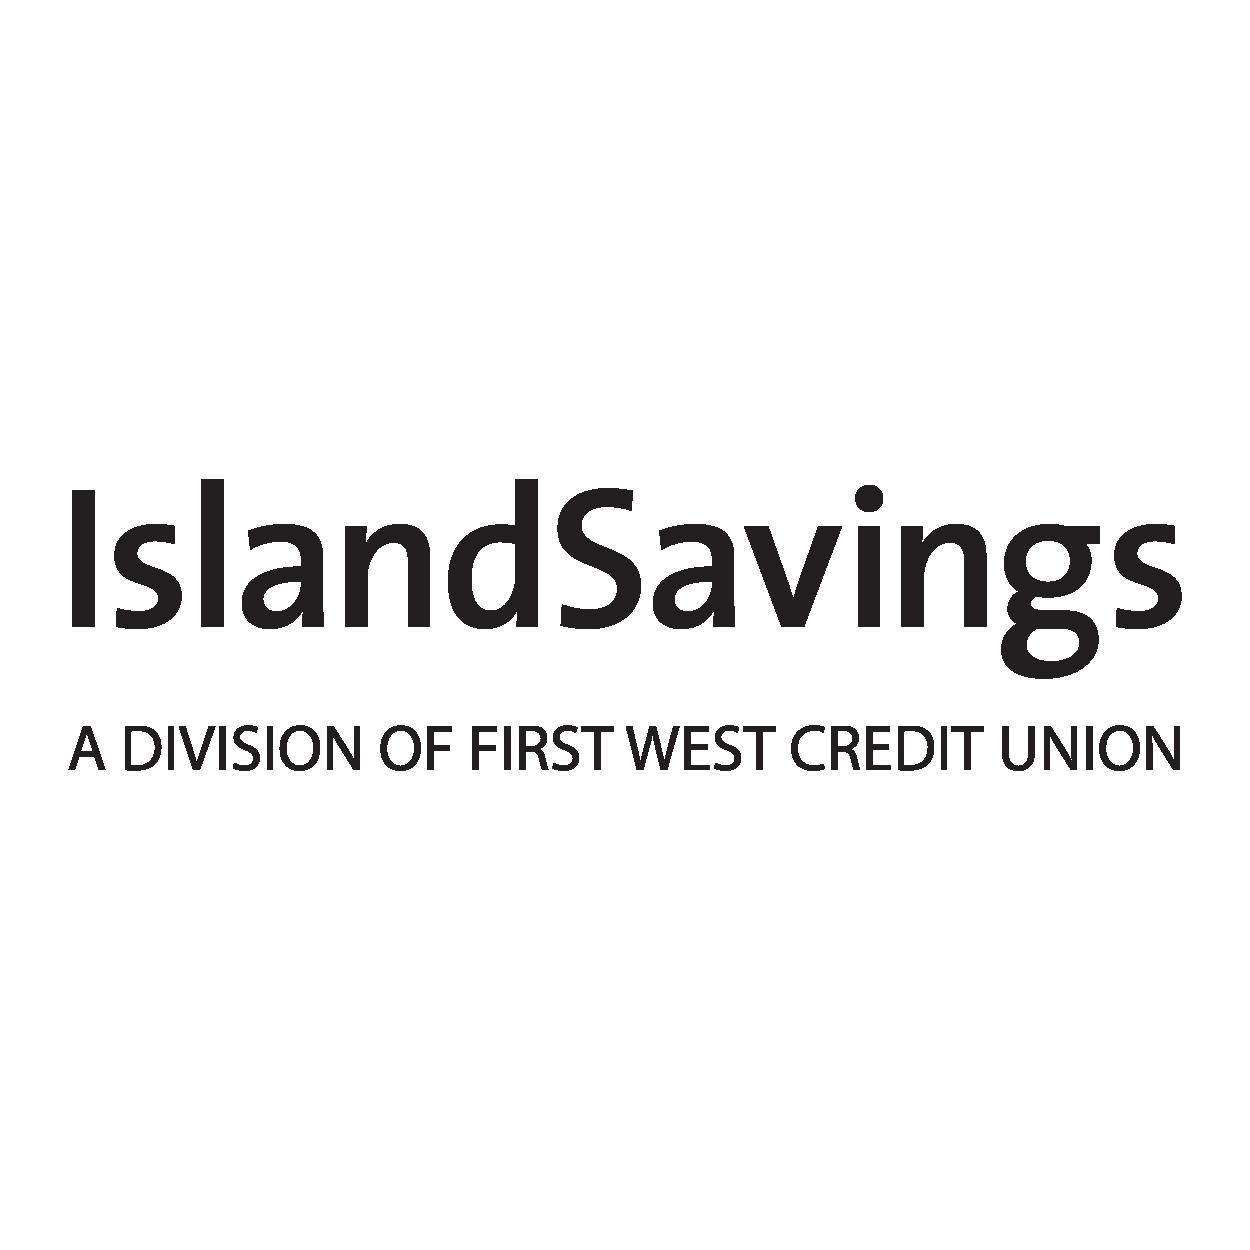 IslandSavings_Logo_BW-01.png